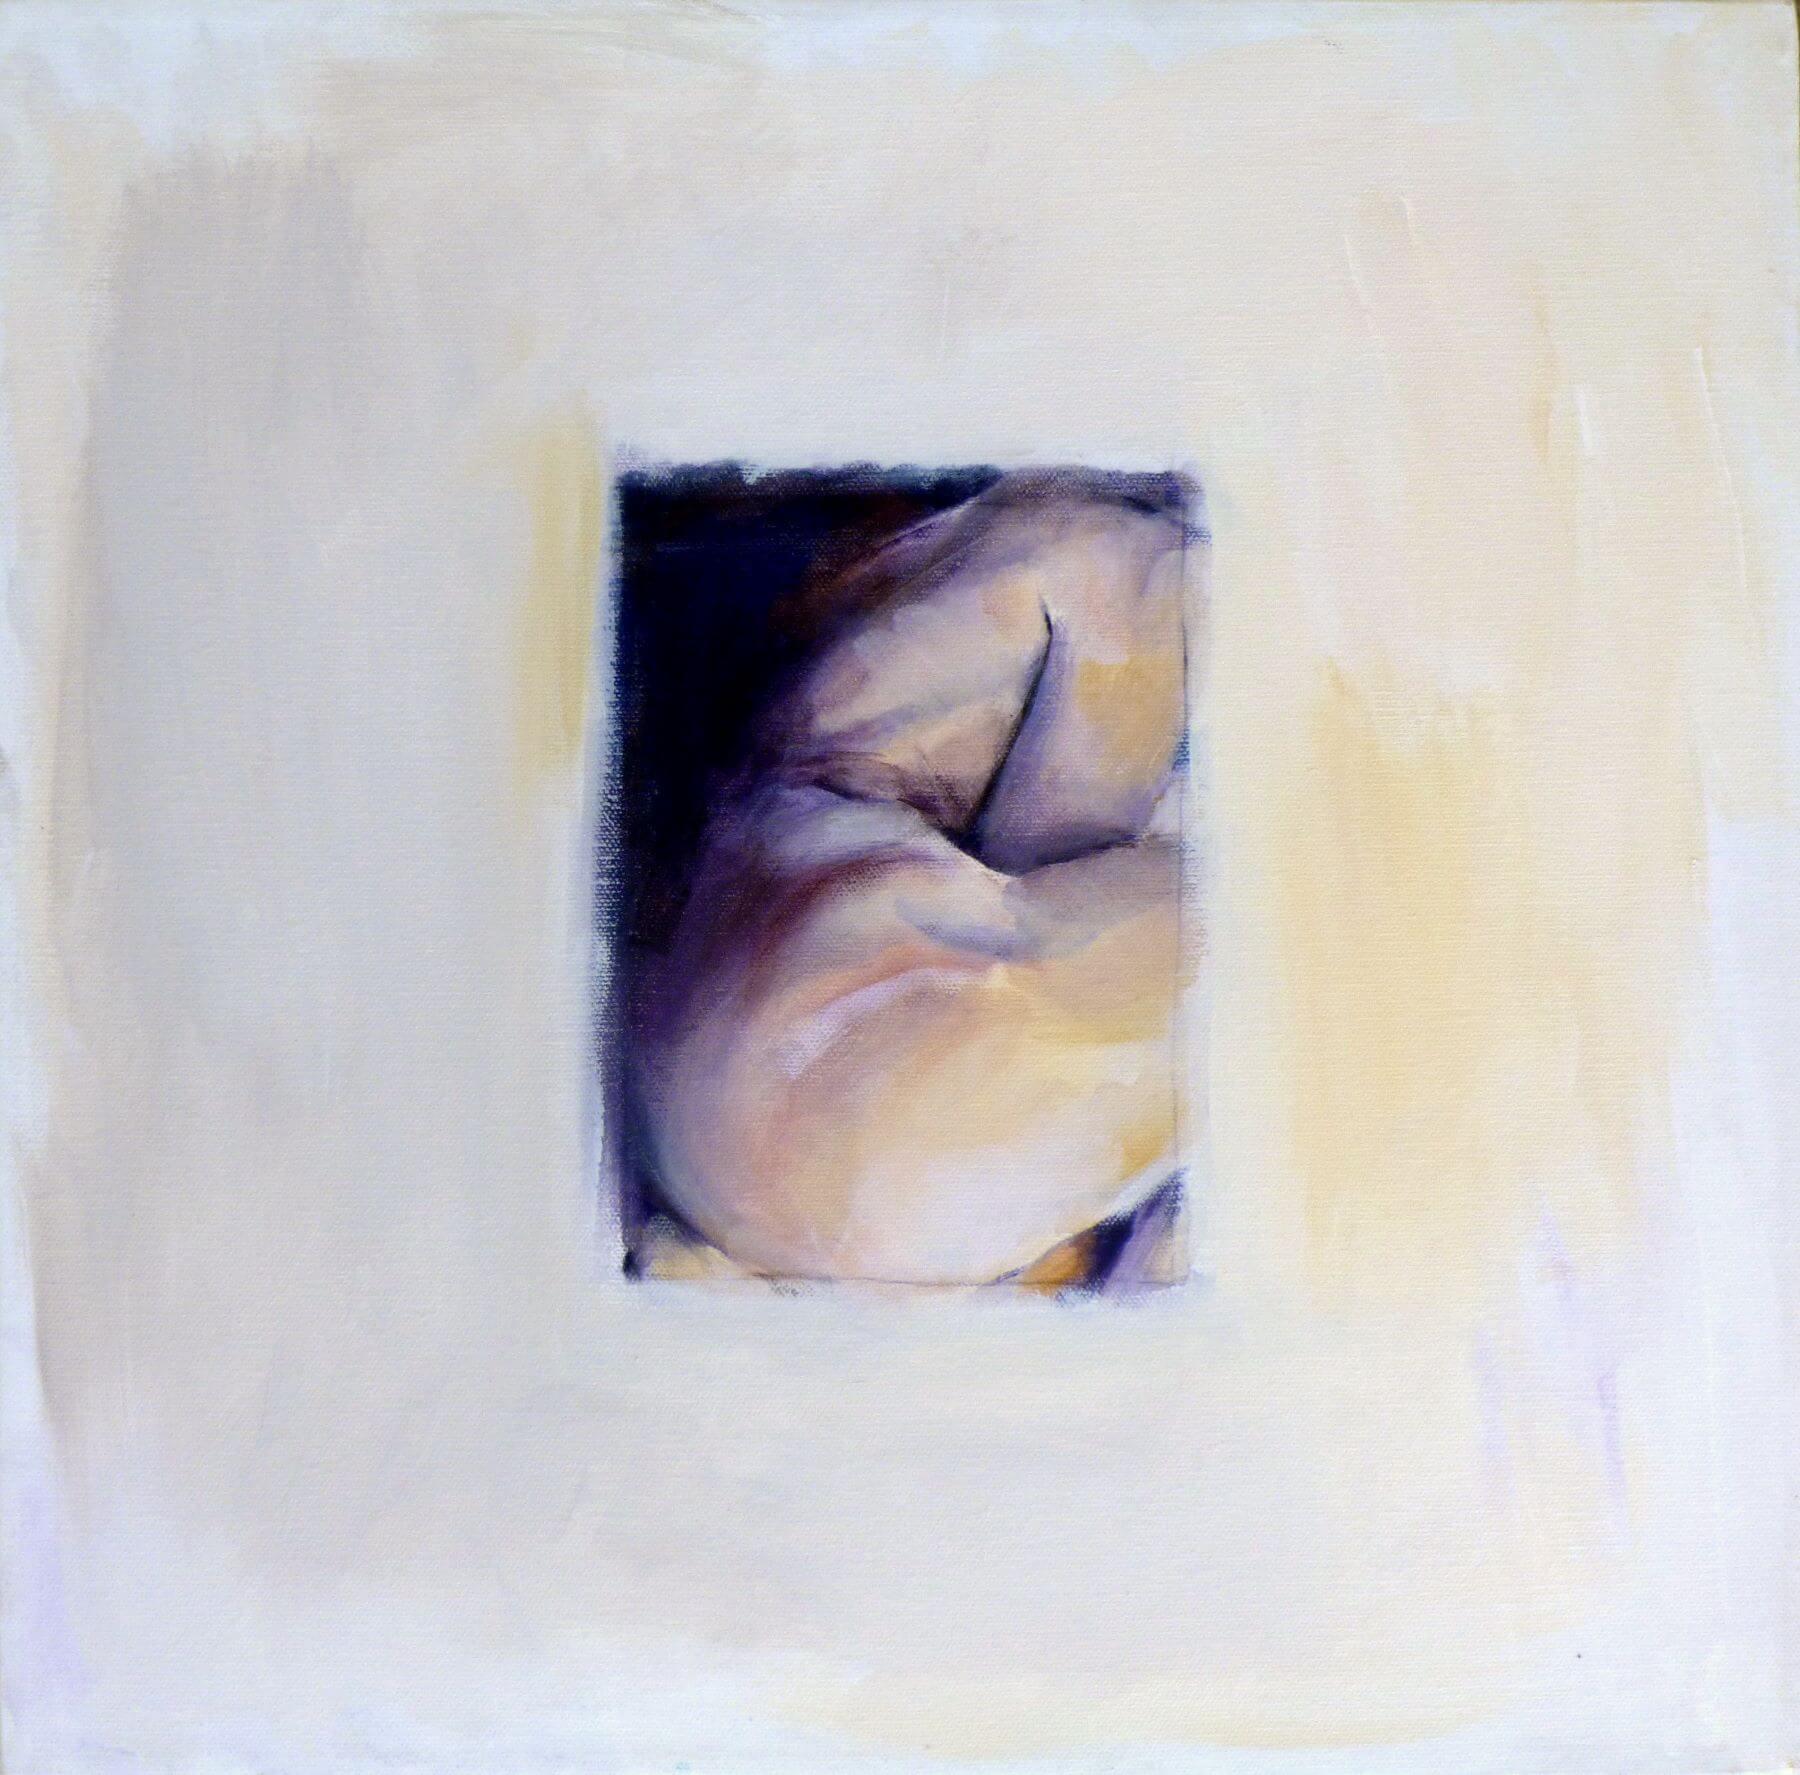 Heart 2 - painting, acrylic on canvas by artist Neva Bergemann